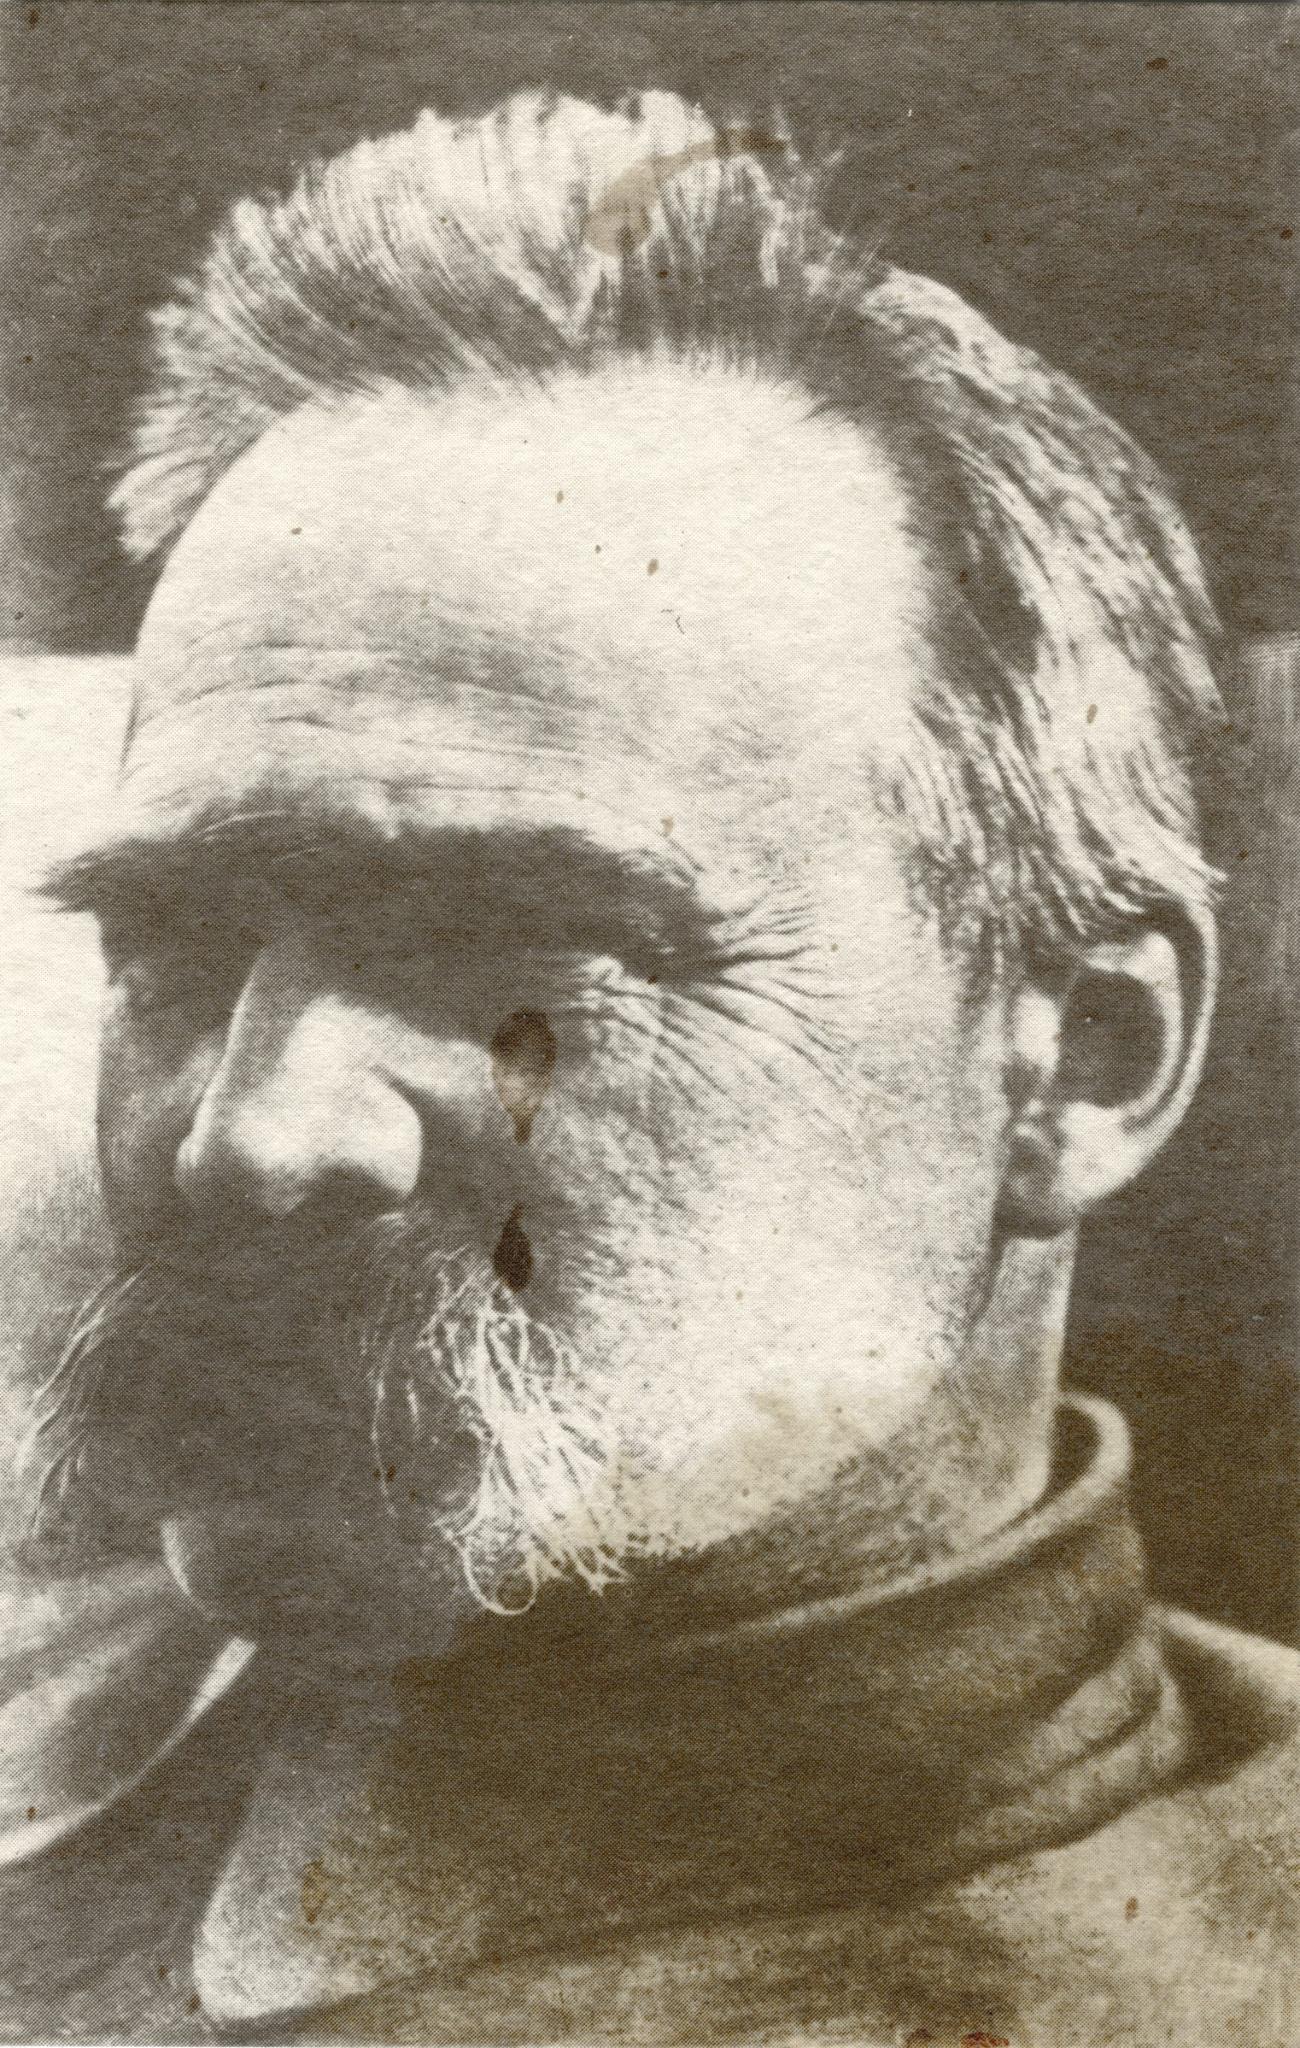 <div class='inner-box'><div class='close-desc'></div><span class='opis'>J&oacute;zef Piłsudski, 1920 (Portrety Historyczne nr 2)</span><div class='clearfix'></div><span>Sygn. FIL03147</span><div class='clearfix'></div><span>&copy; Instytut Literacki</span></div>